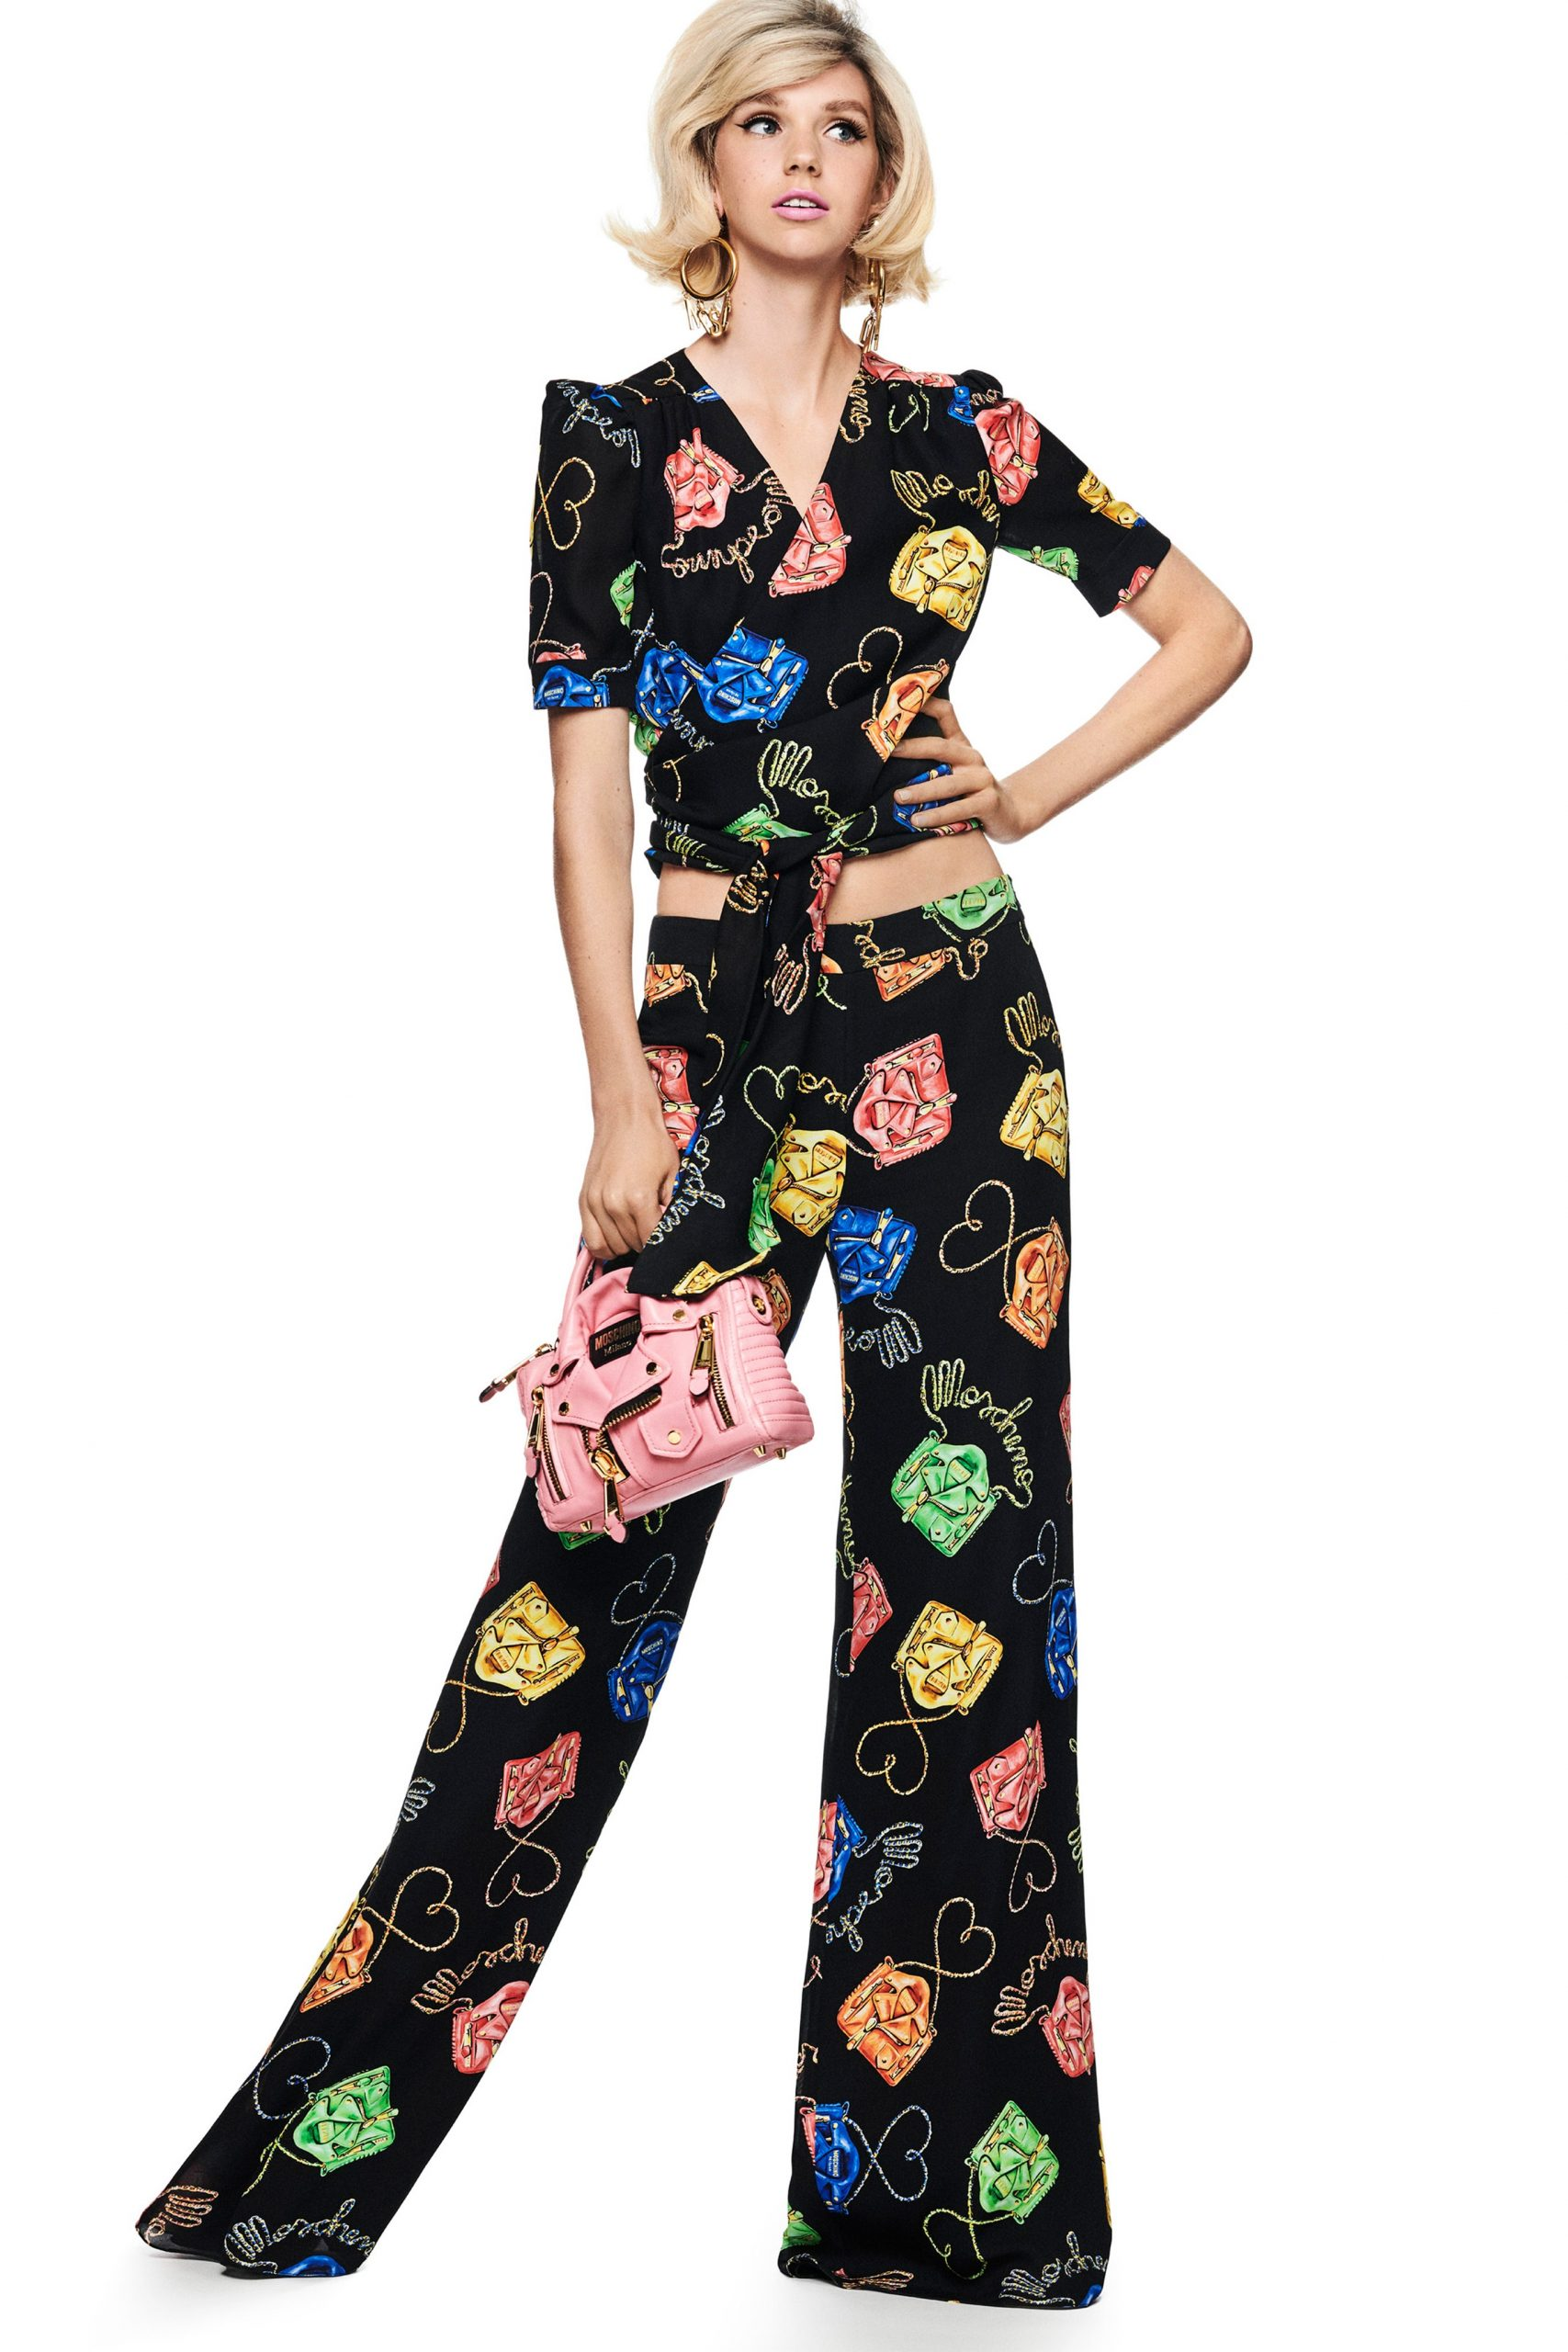 Moschino Resort 2021 Fashion Collection Photos